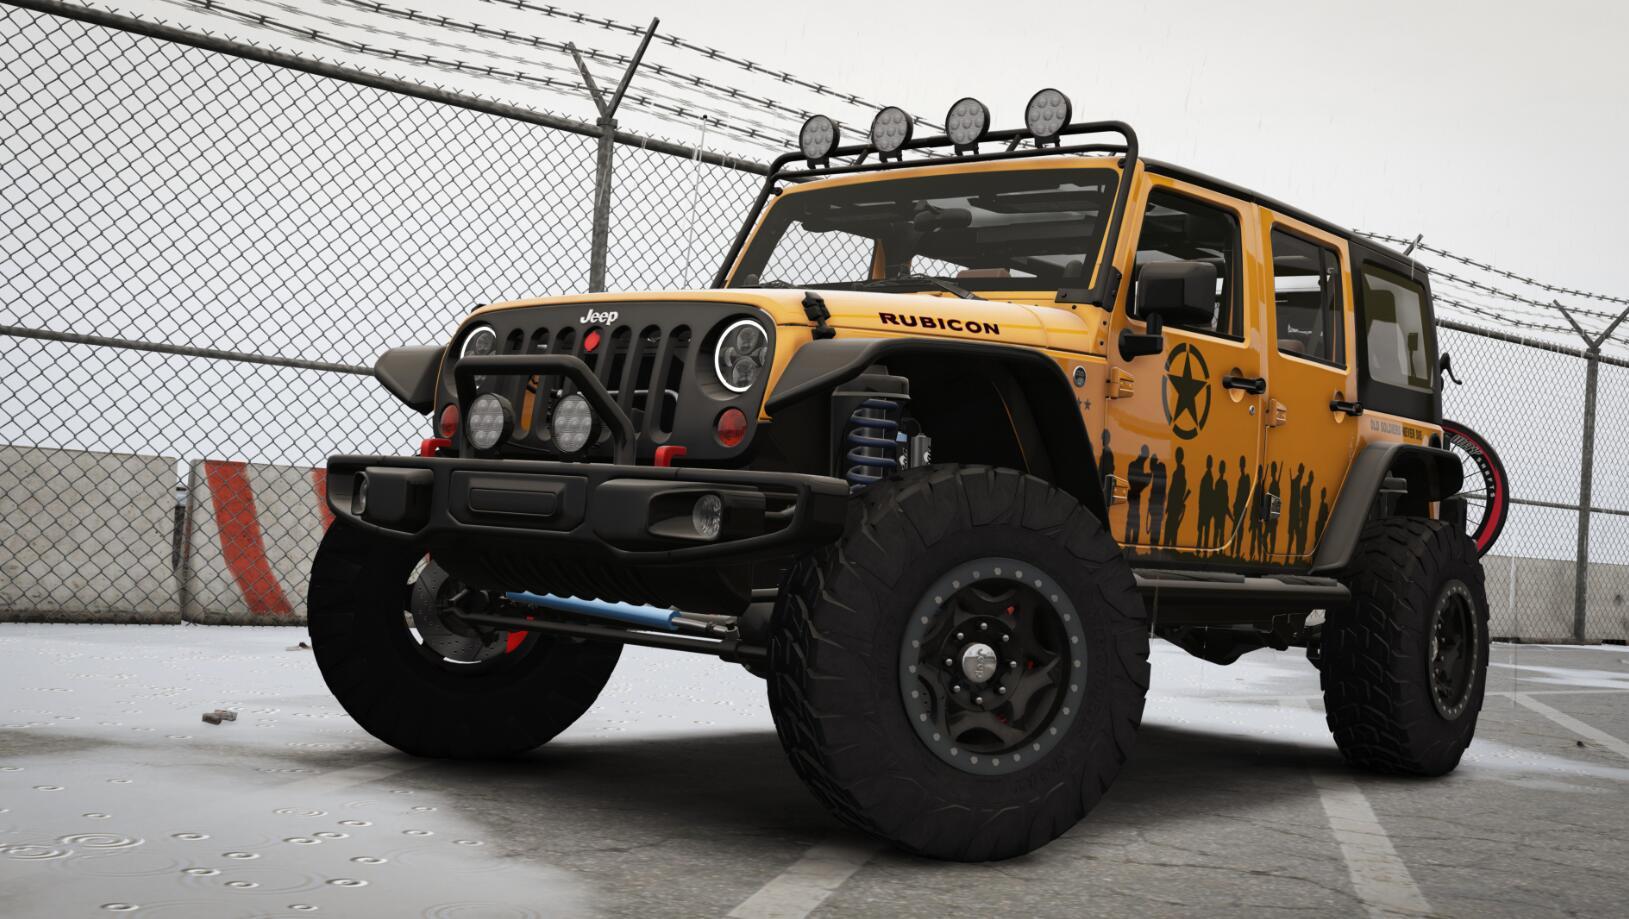 jeep wrangler 2012 rubicon gta5. Black Bedroom Furniture Sets. Home Design Ideas